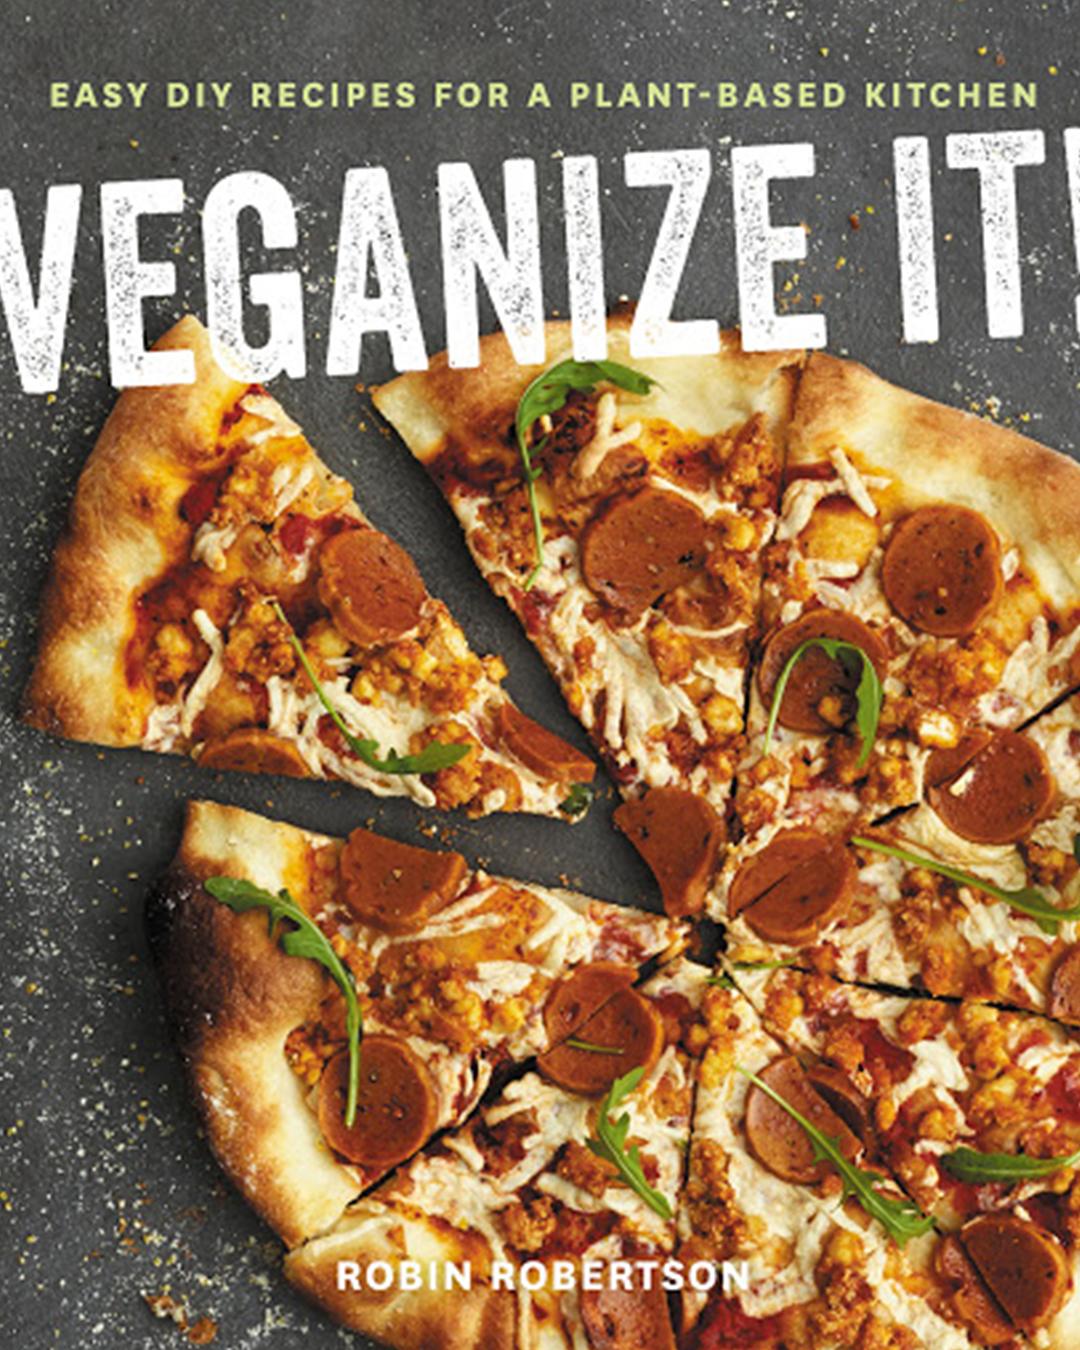 Veganize It